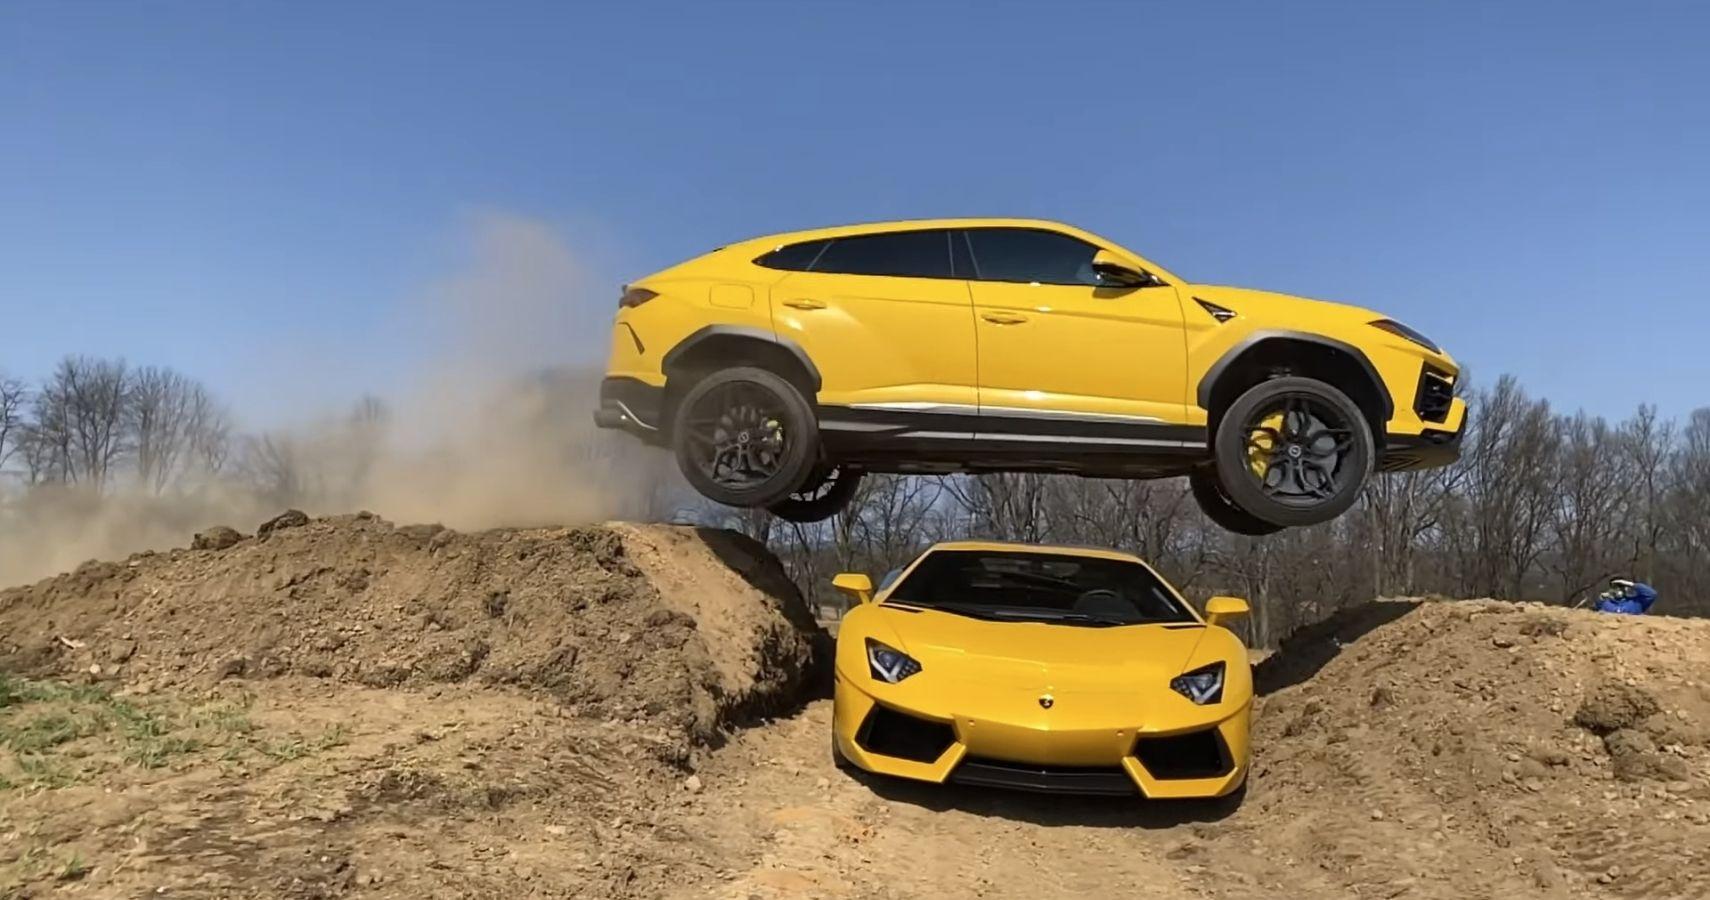 YouTuber Pulls Risky Stunt Jumping A Lamborghini Urus Over His Fiance's Aventador